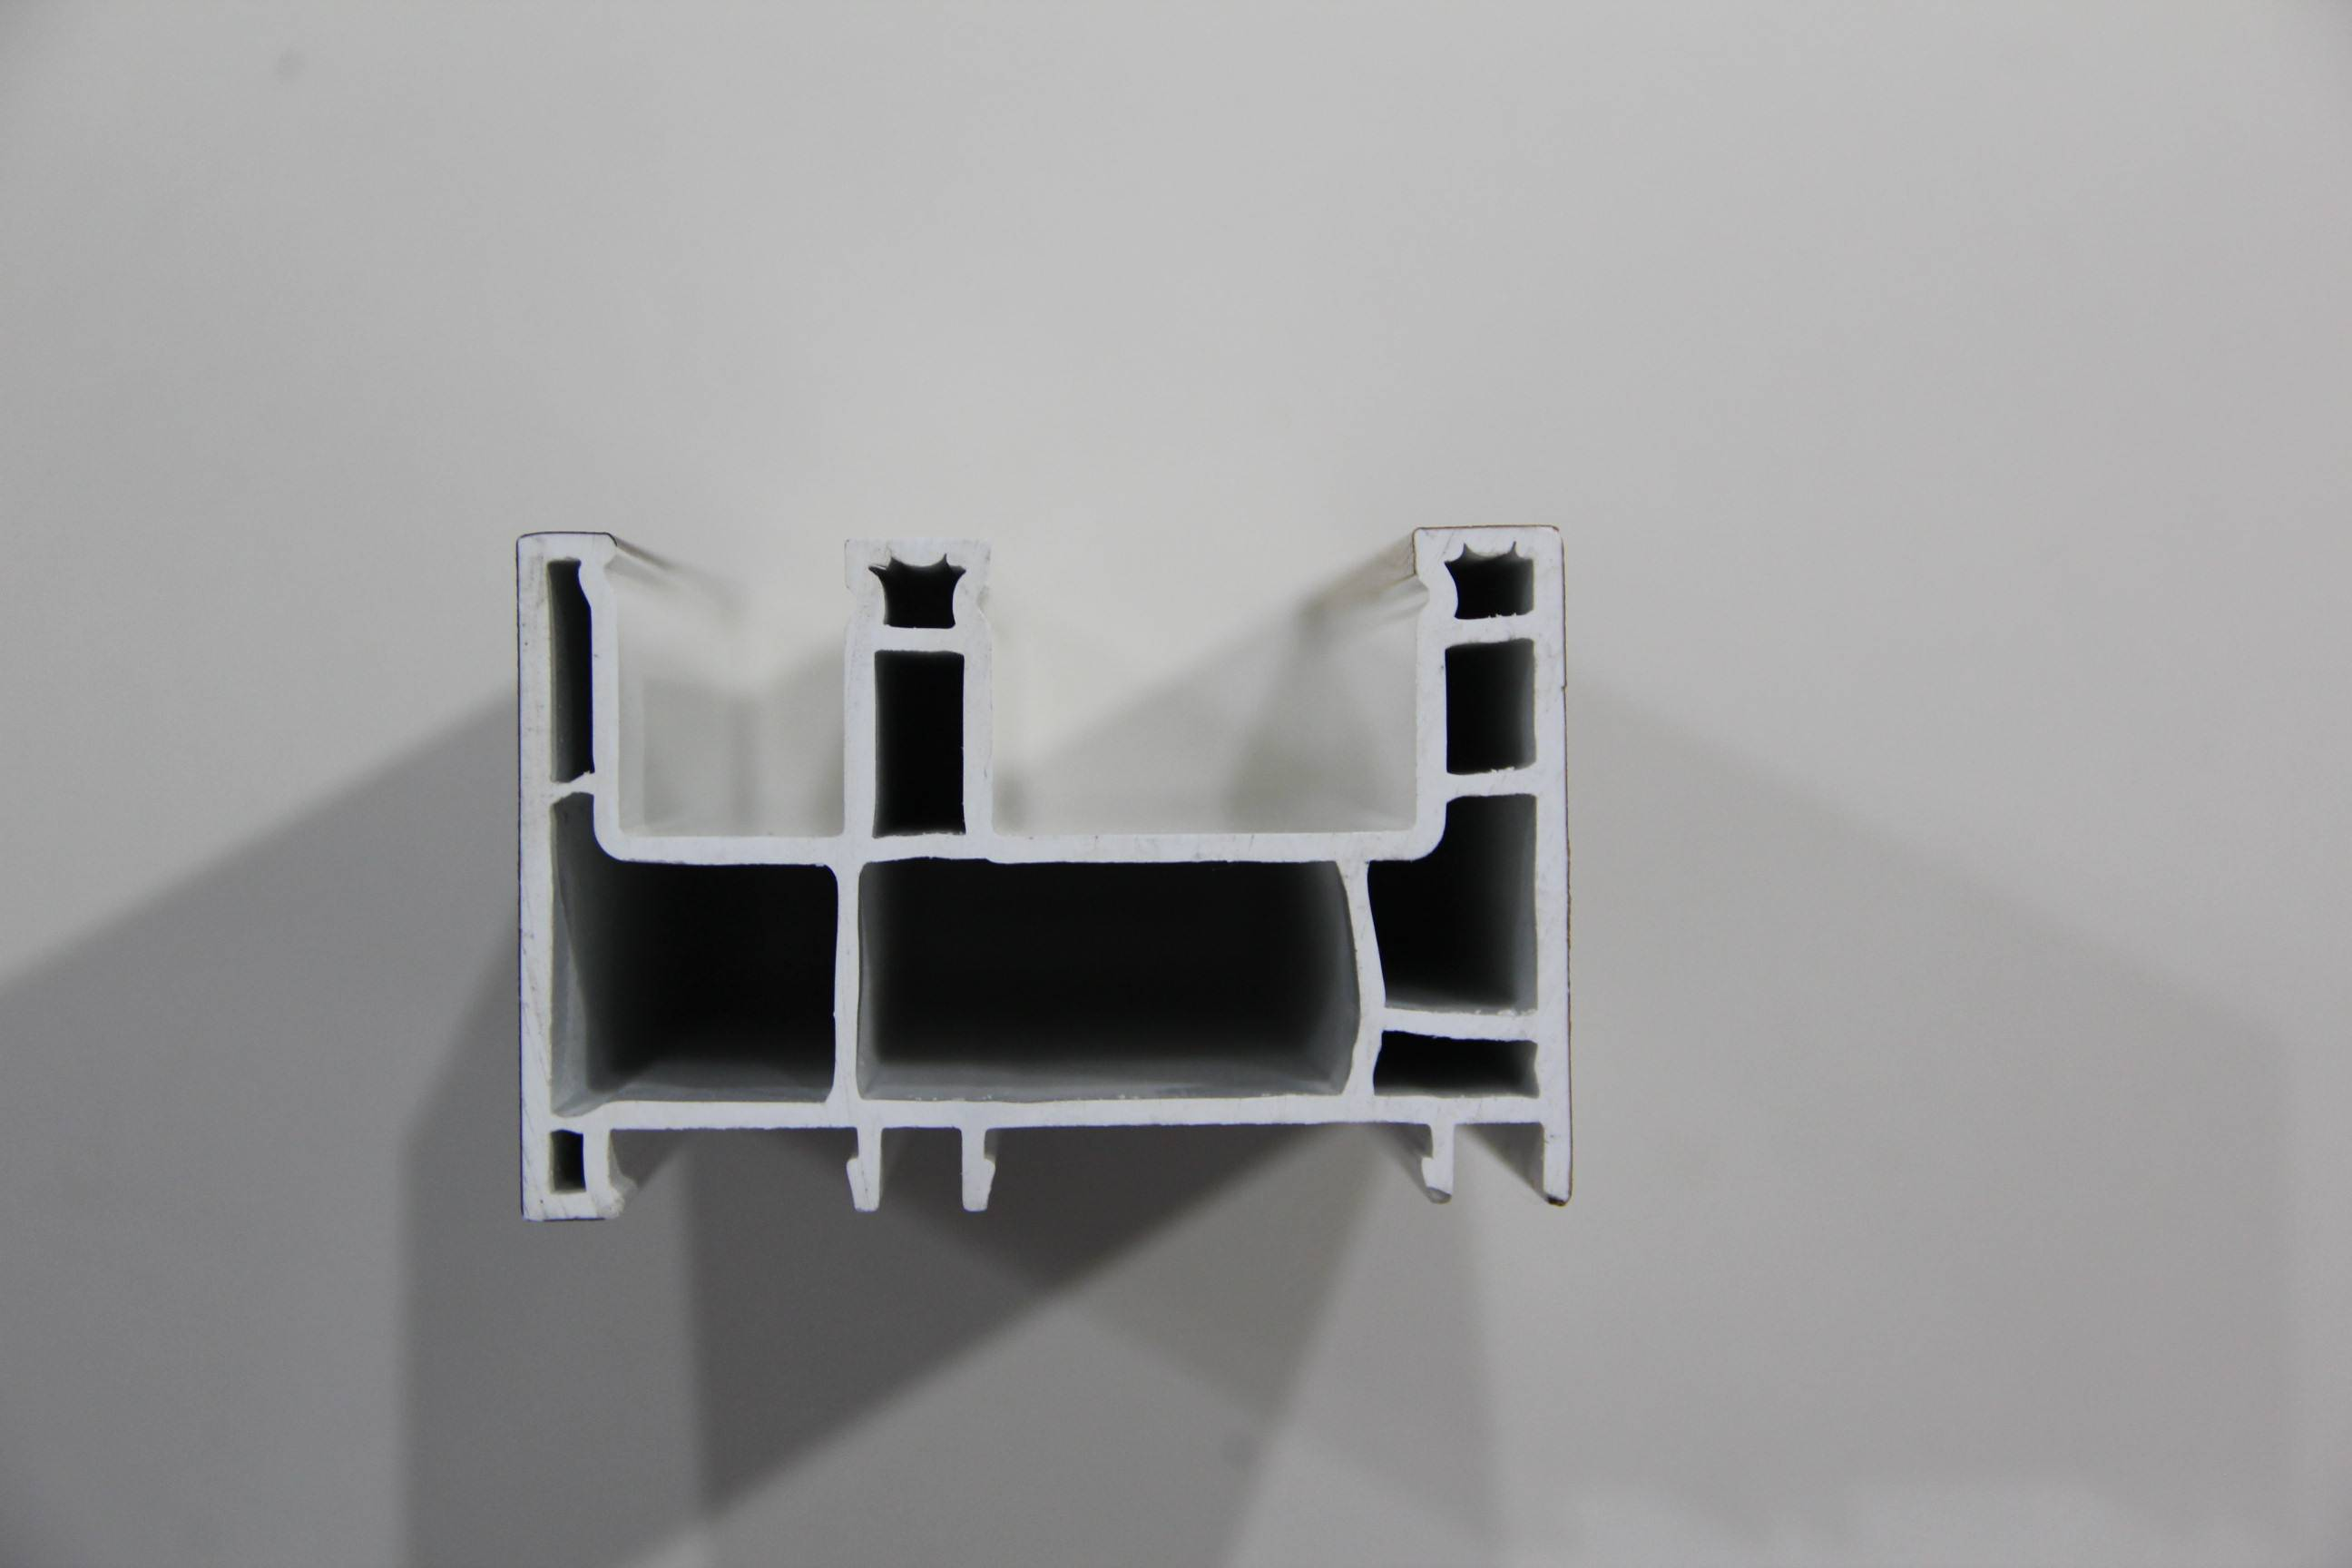 88mm 3 track sliding window profile plastic upvc profile